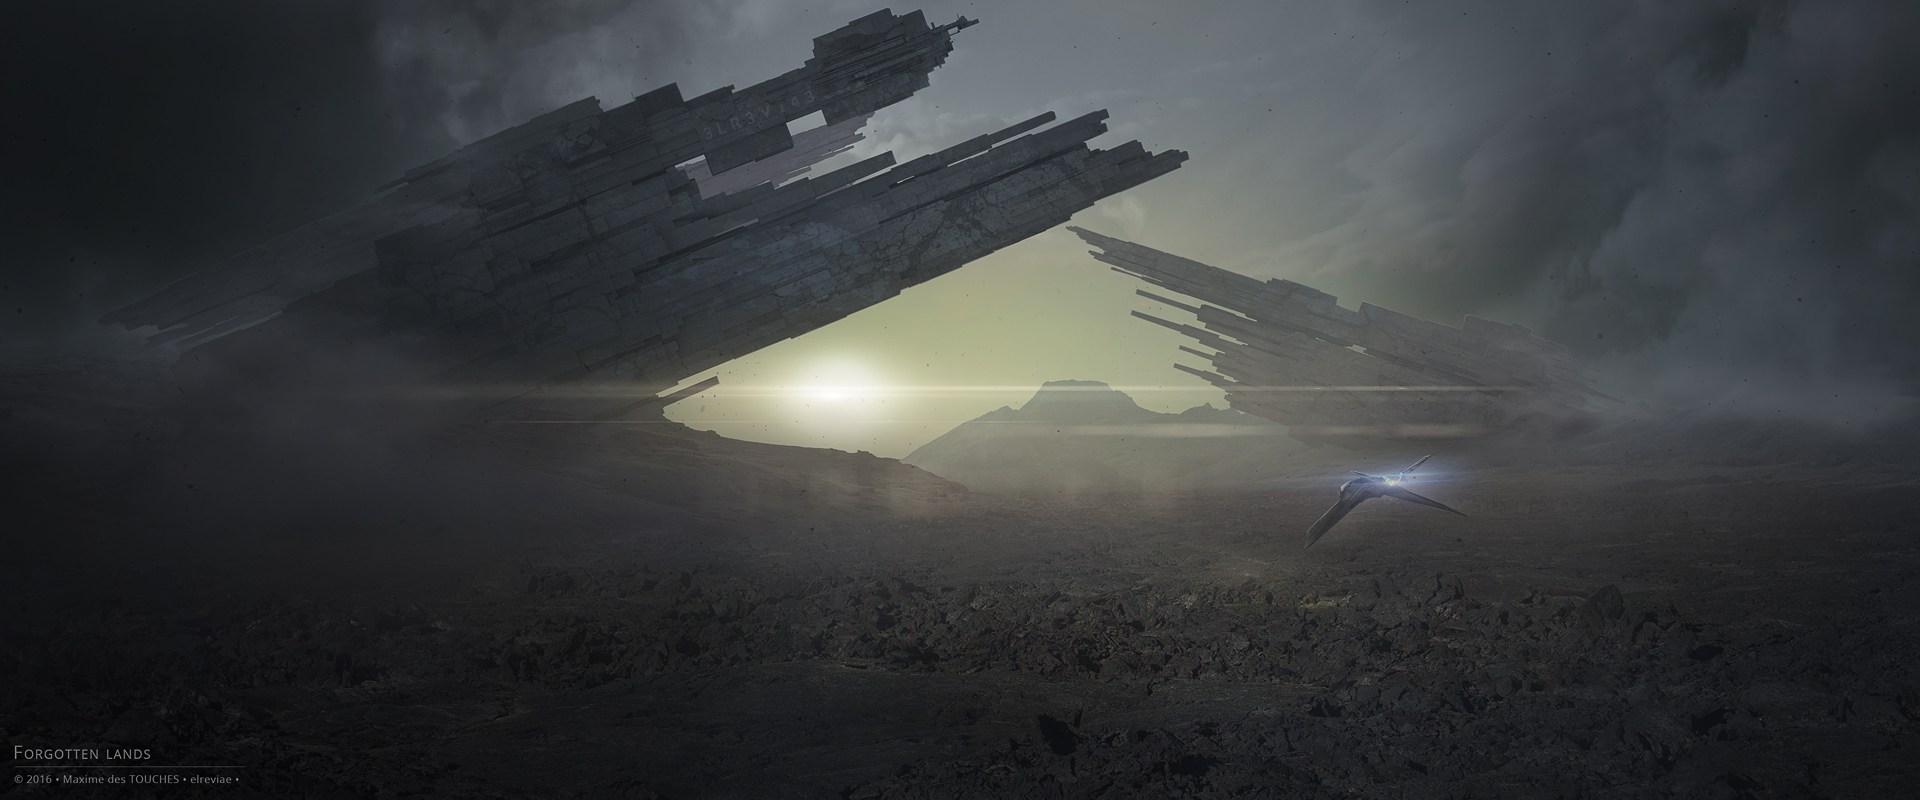 Forgotten Lands Concept art Science fiction artworks